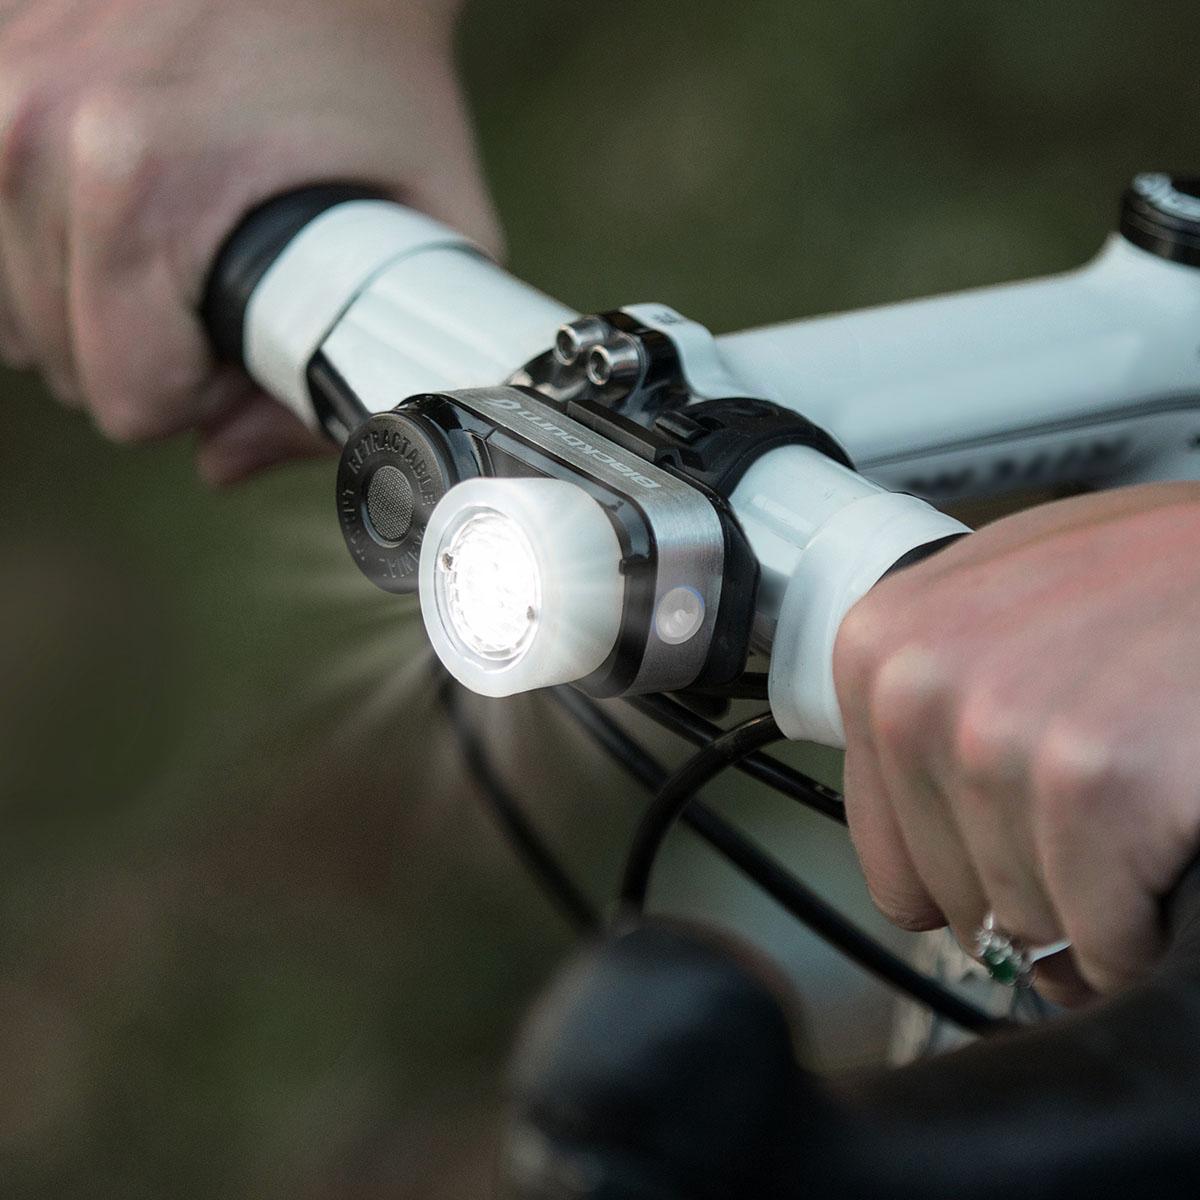 Blackburn Outpost Bike and Camp Dual Purpose Light